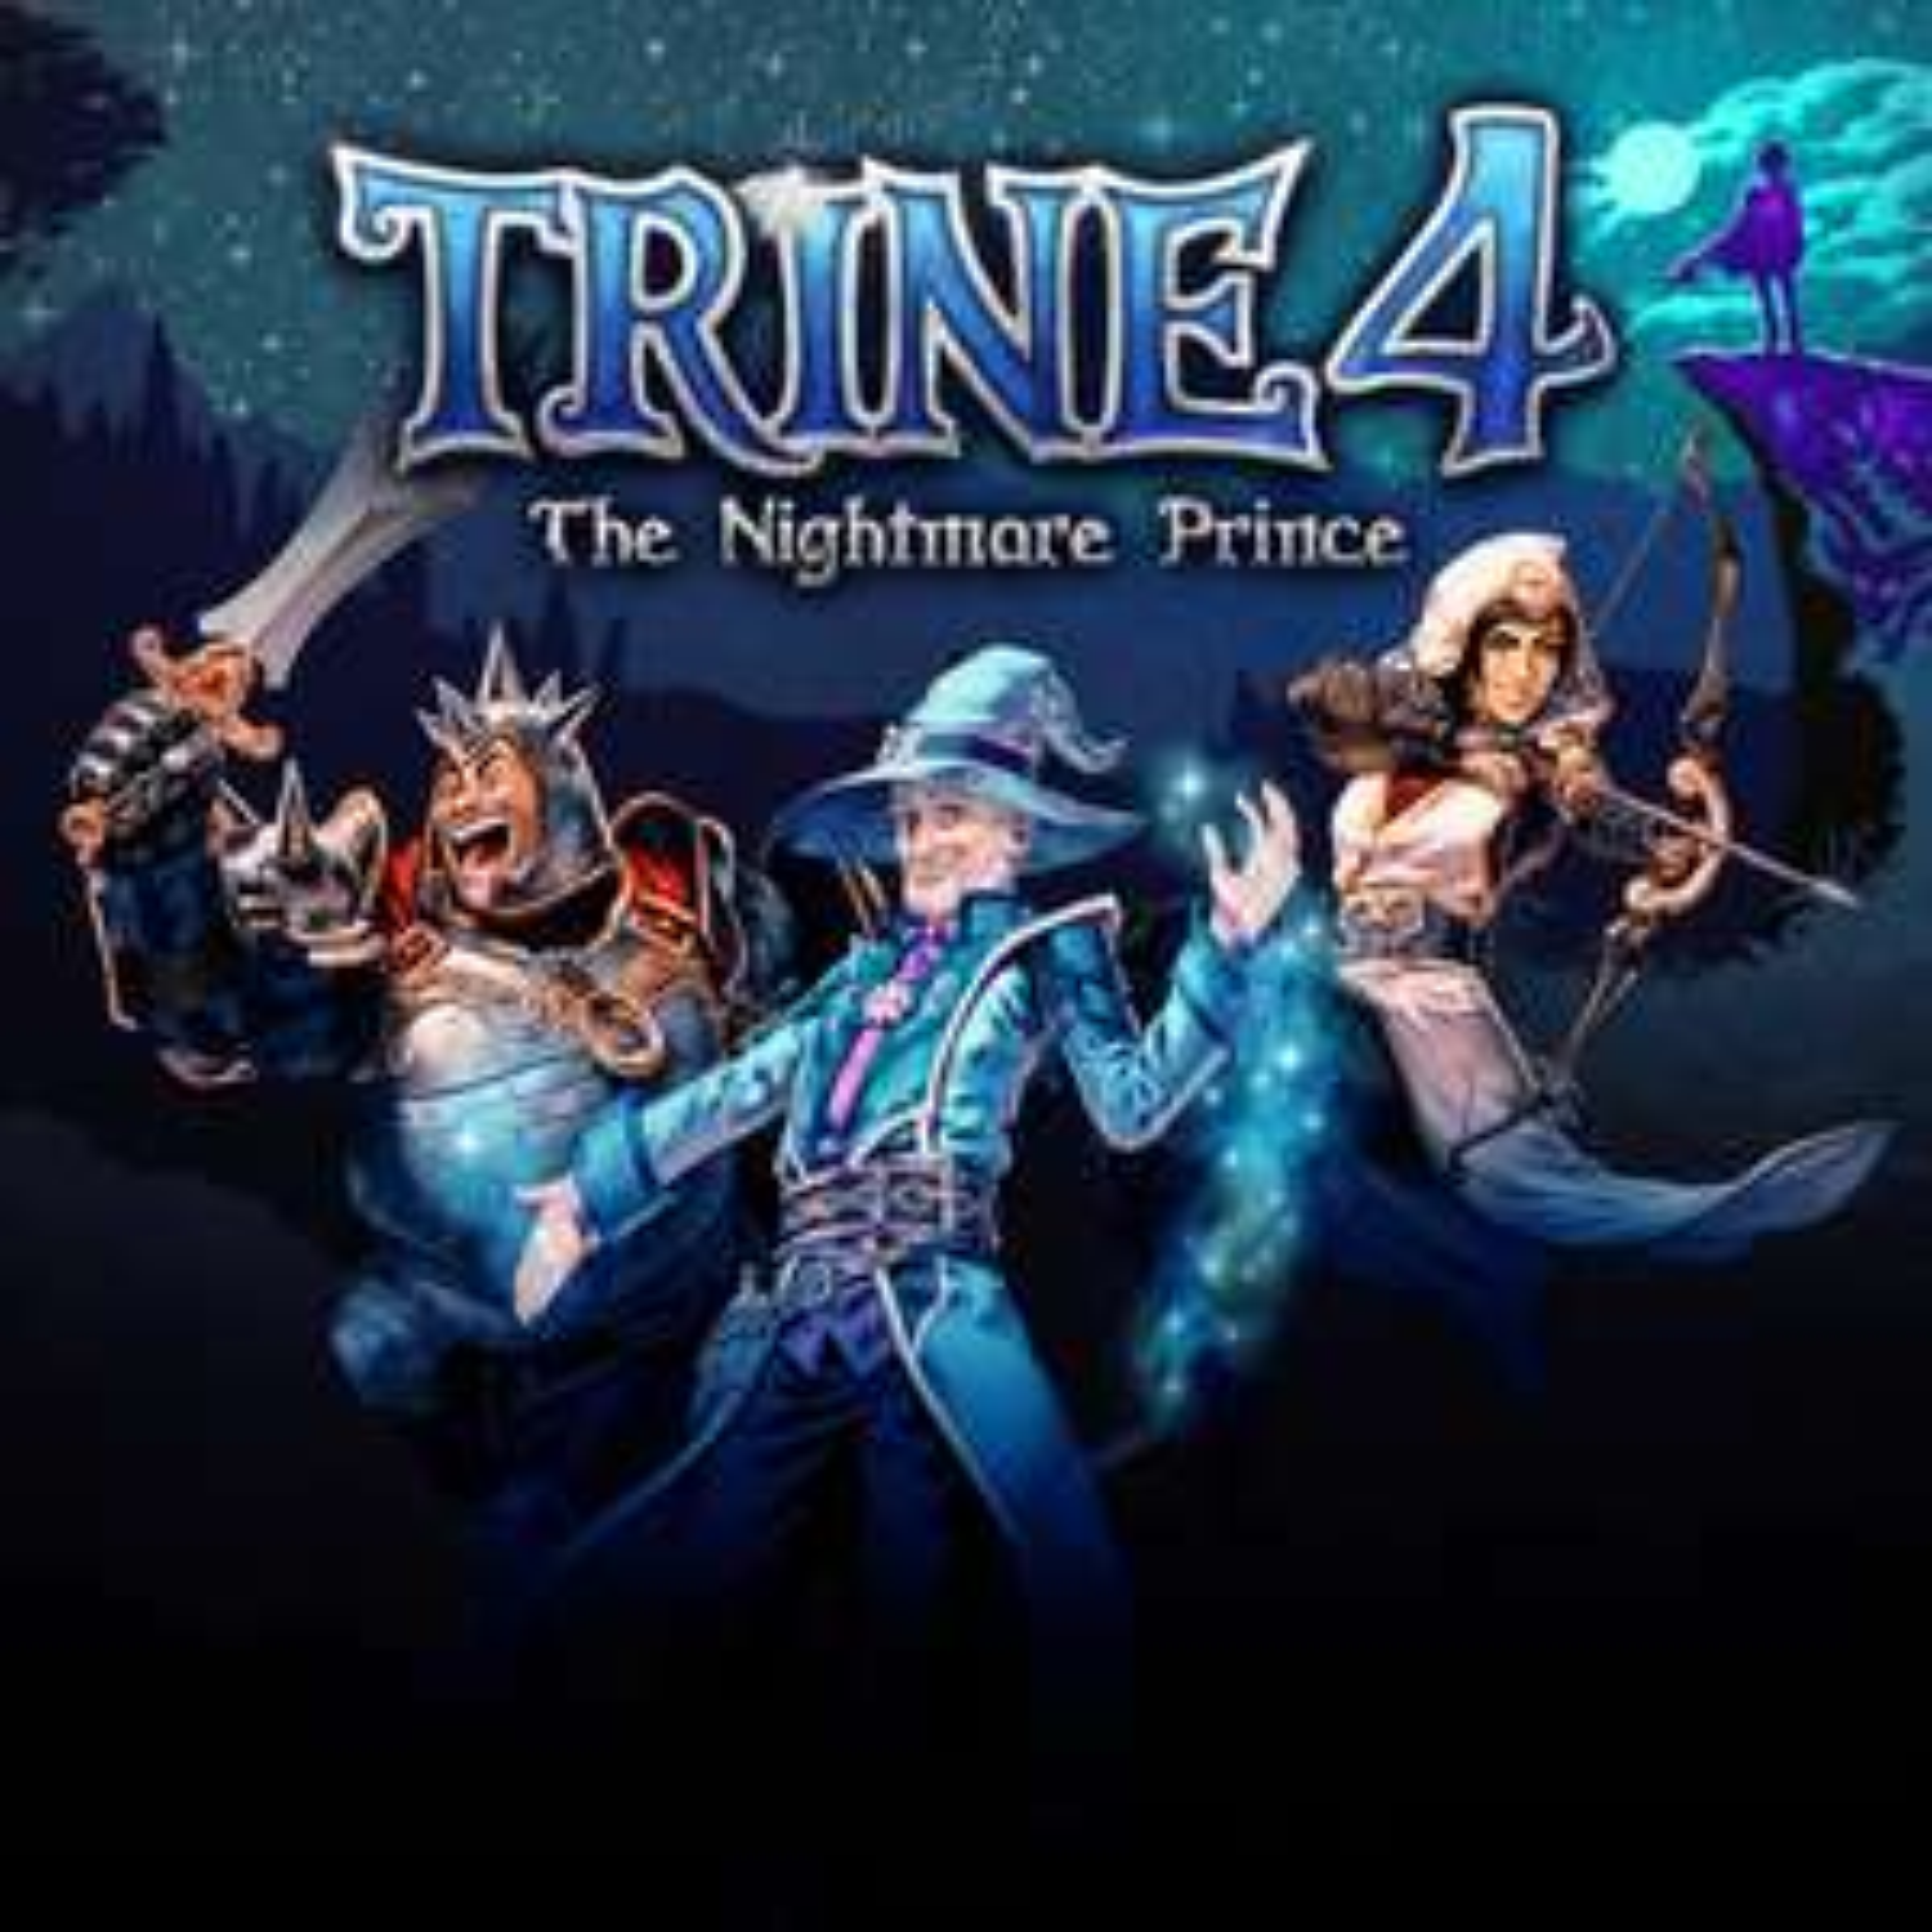 Trine 4: The Nightmare Prince (XBox 360/ XBox One/X/S) Free @ Microsoft Korea With Gold